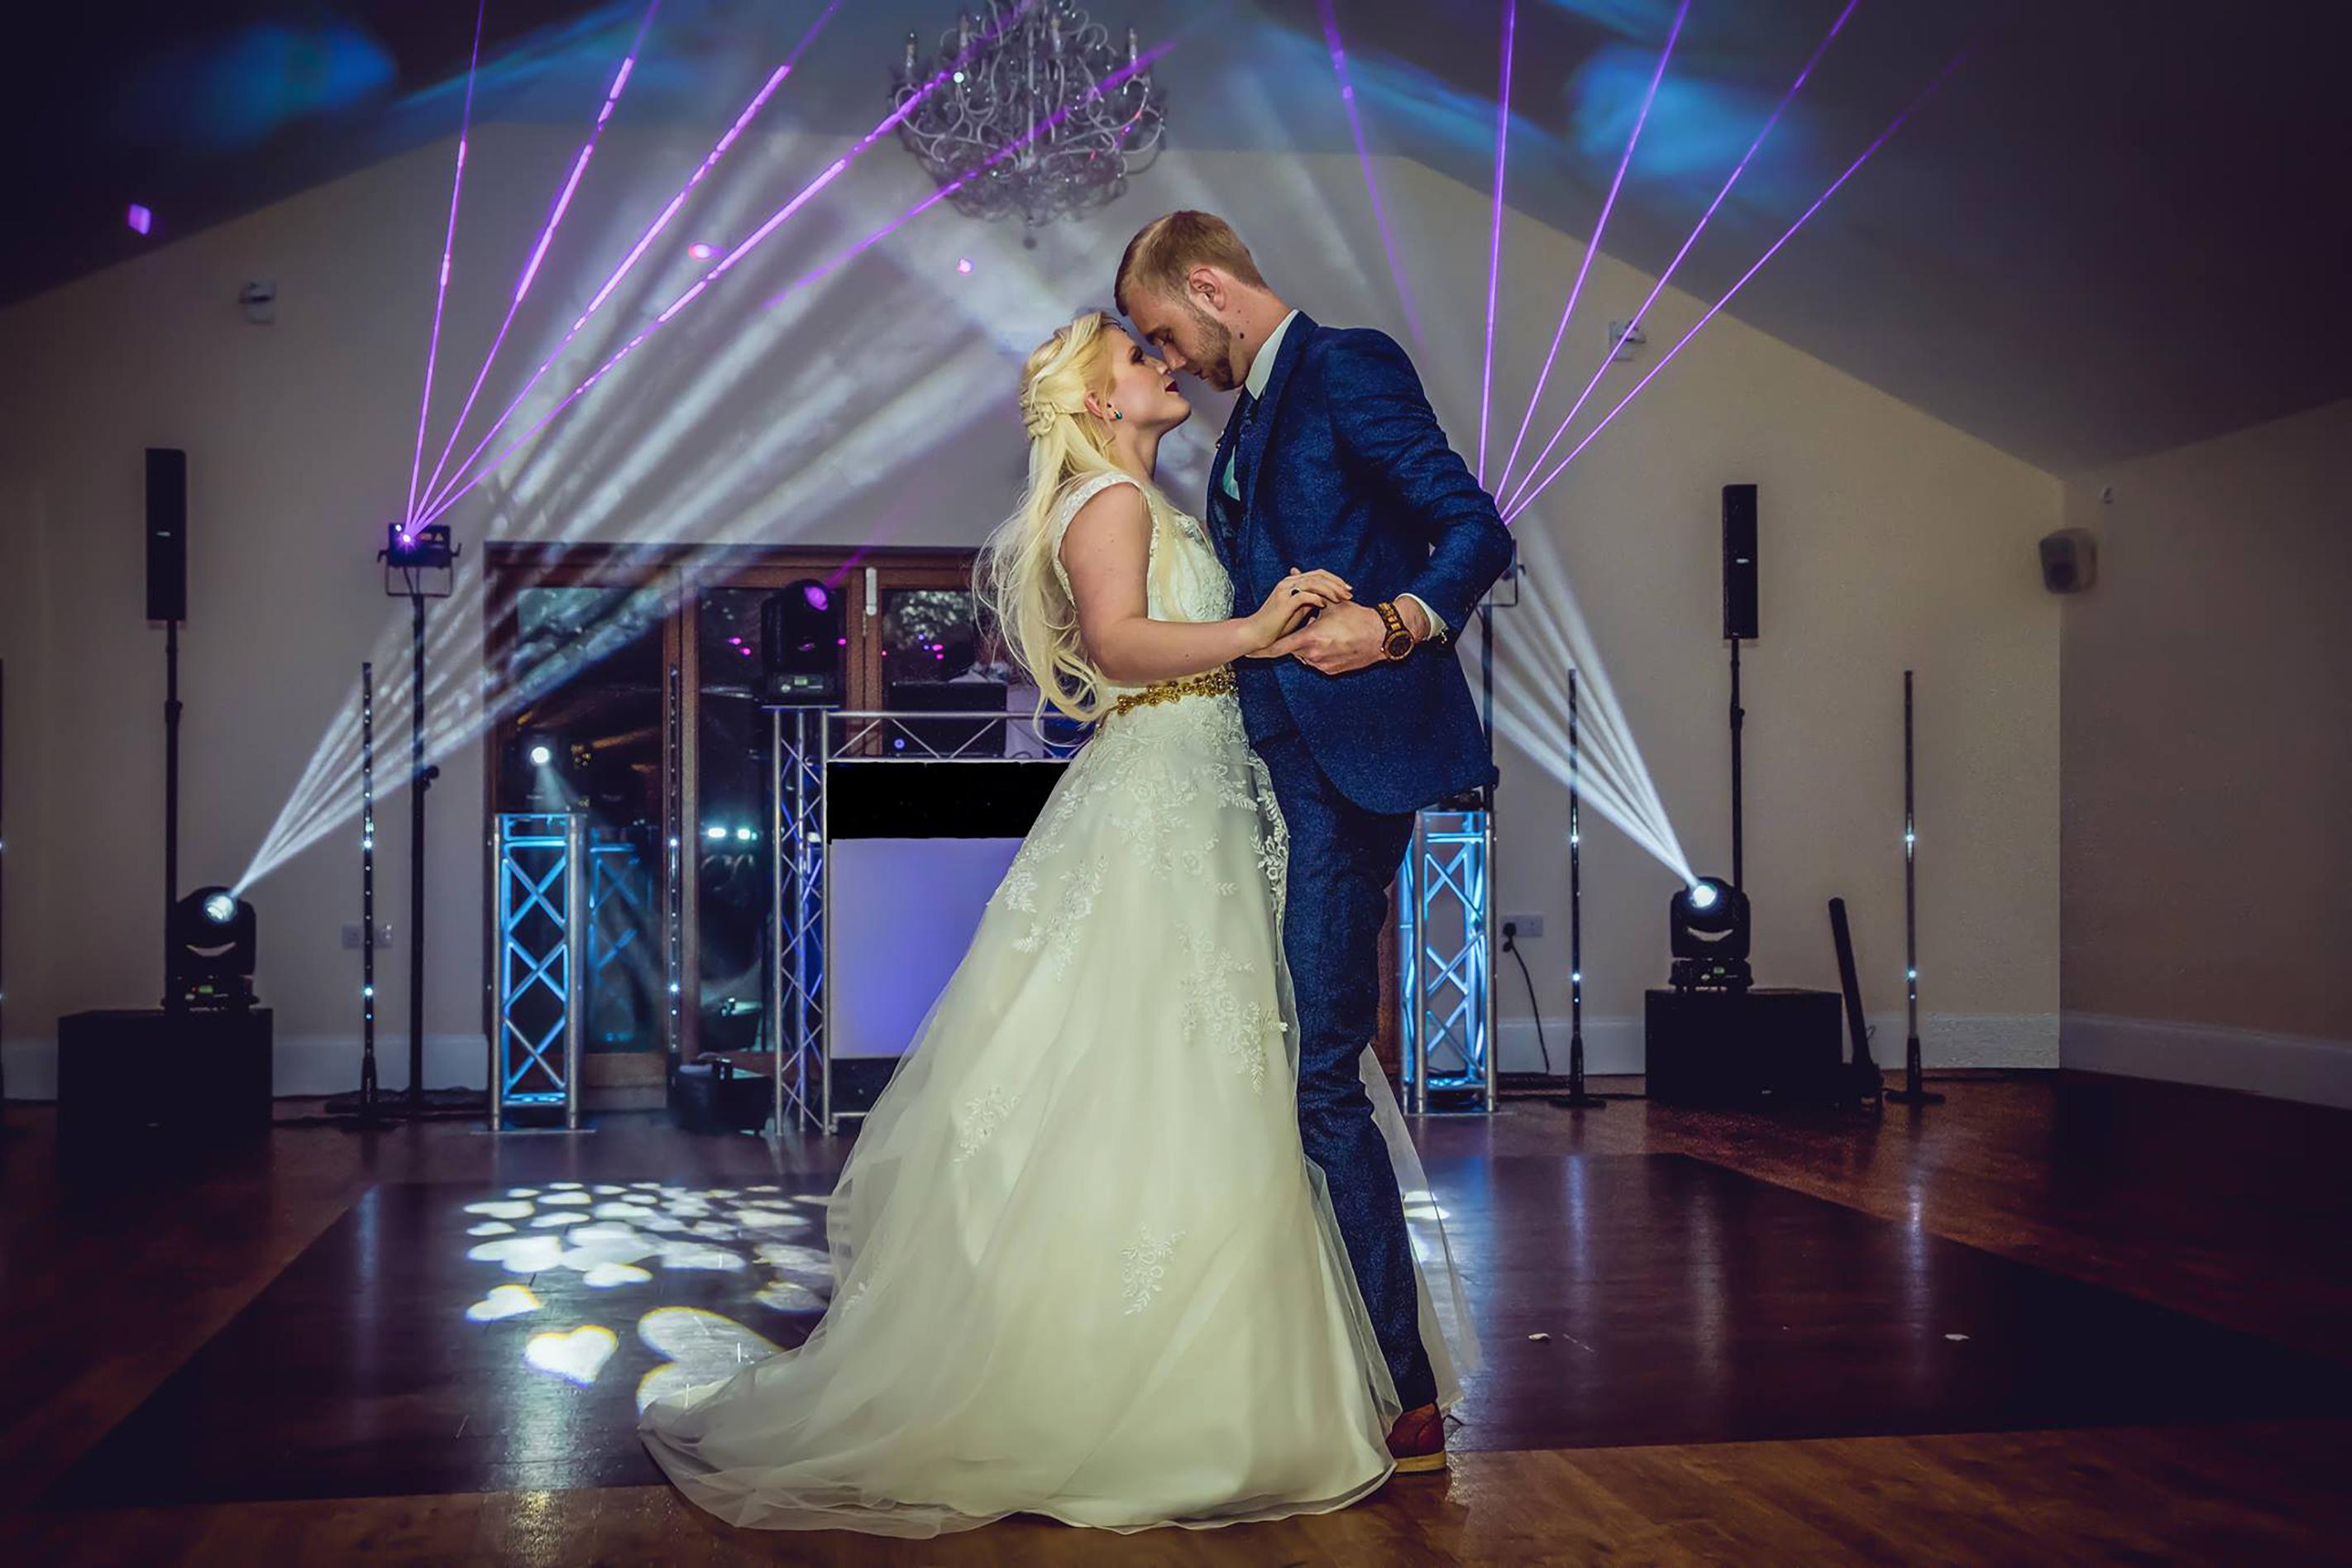 Cornwall Wedding DJ